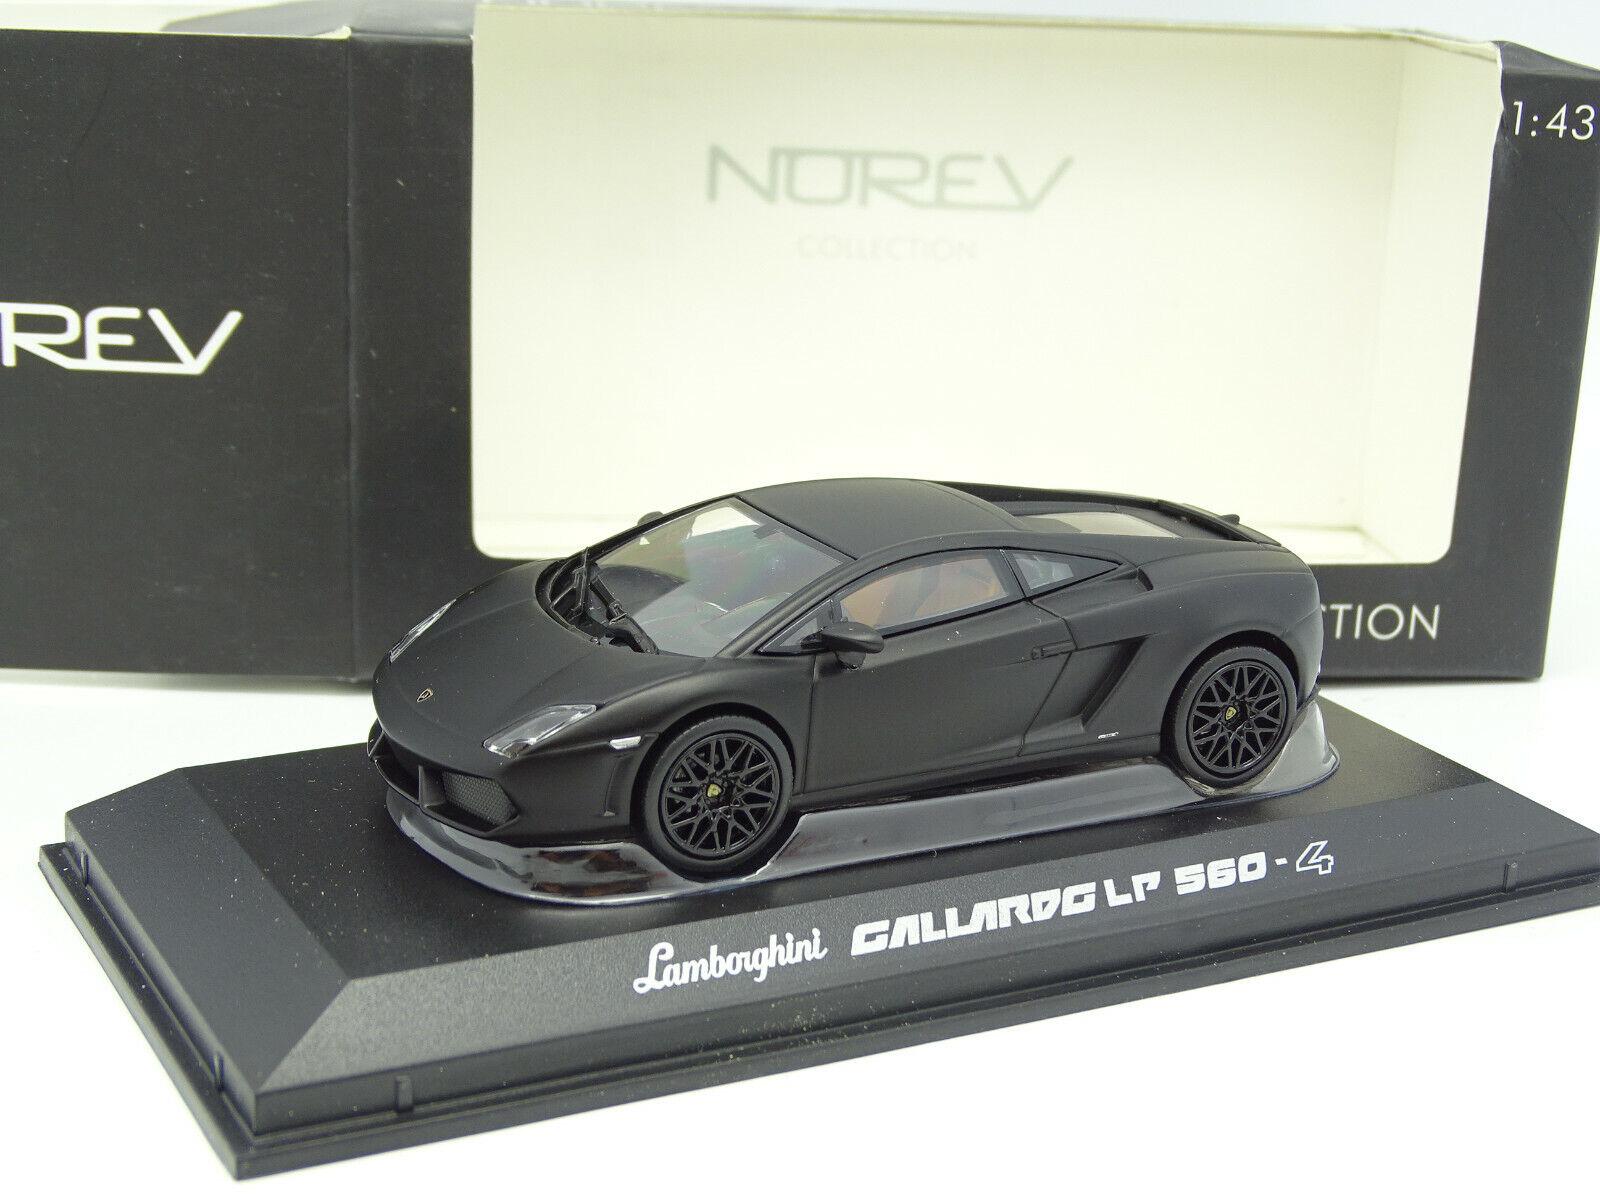 Norev 1 43 - Lamborghini Gallardo LP 560 4 Matte Black